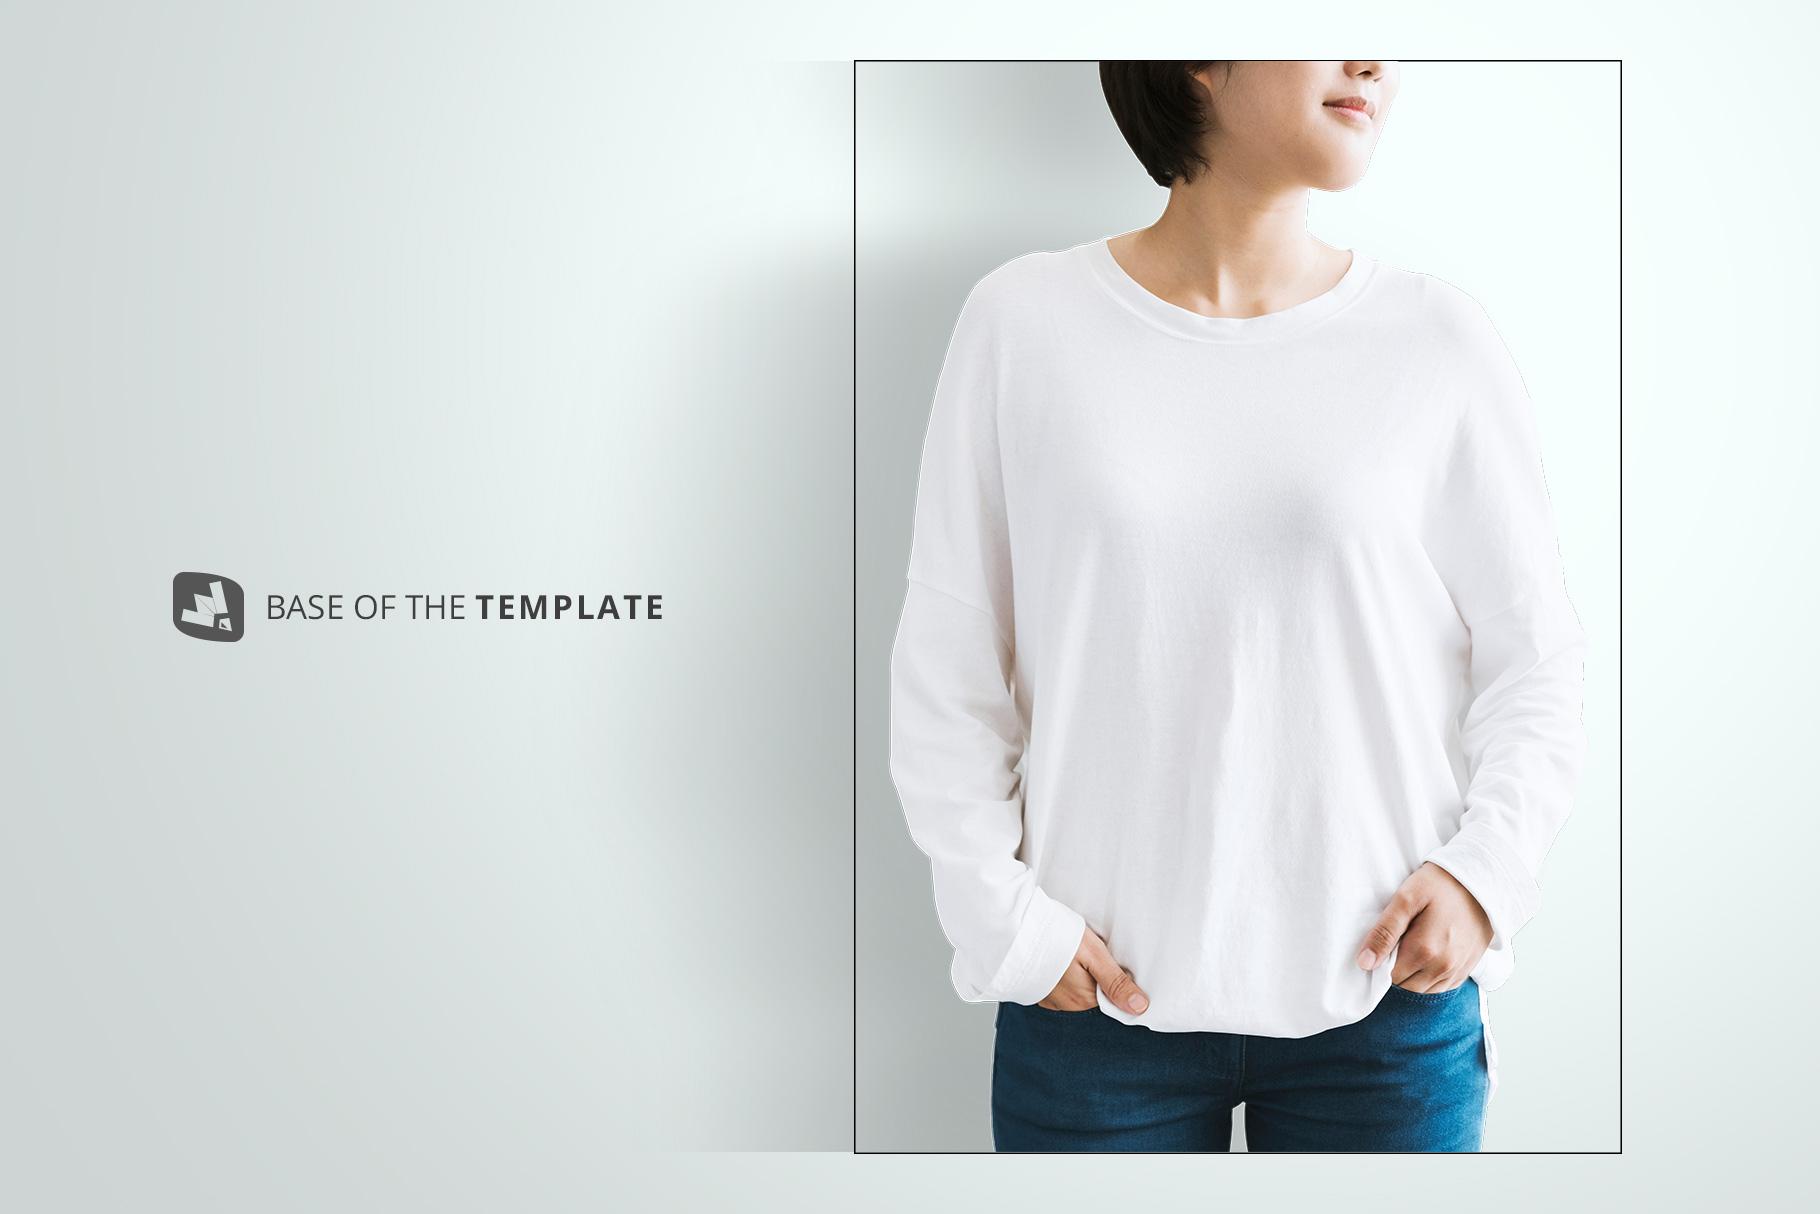 base image of the women's full sleeve tshirt mockup